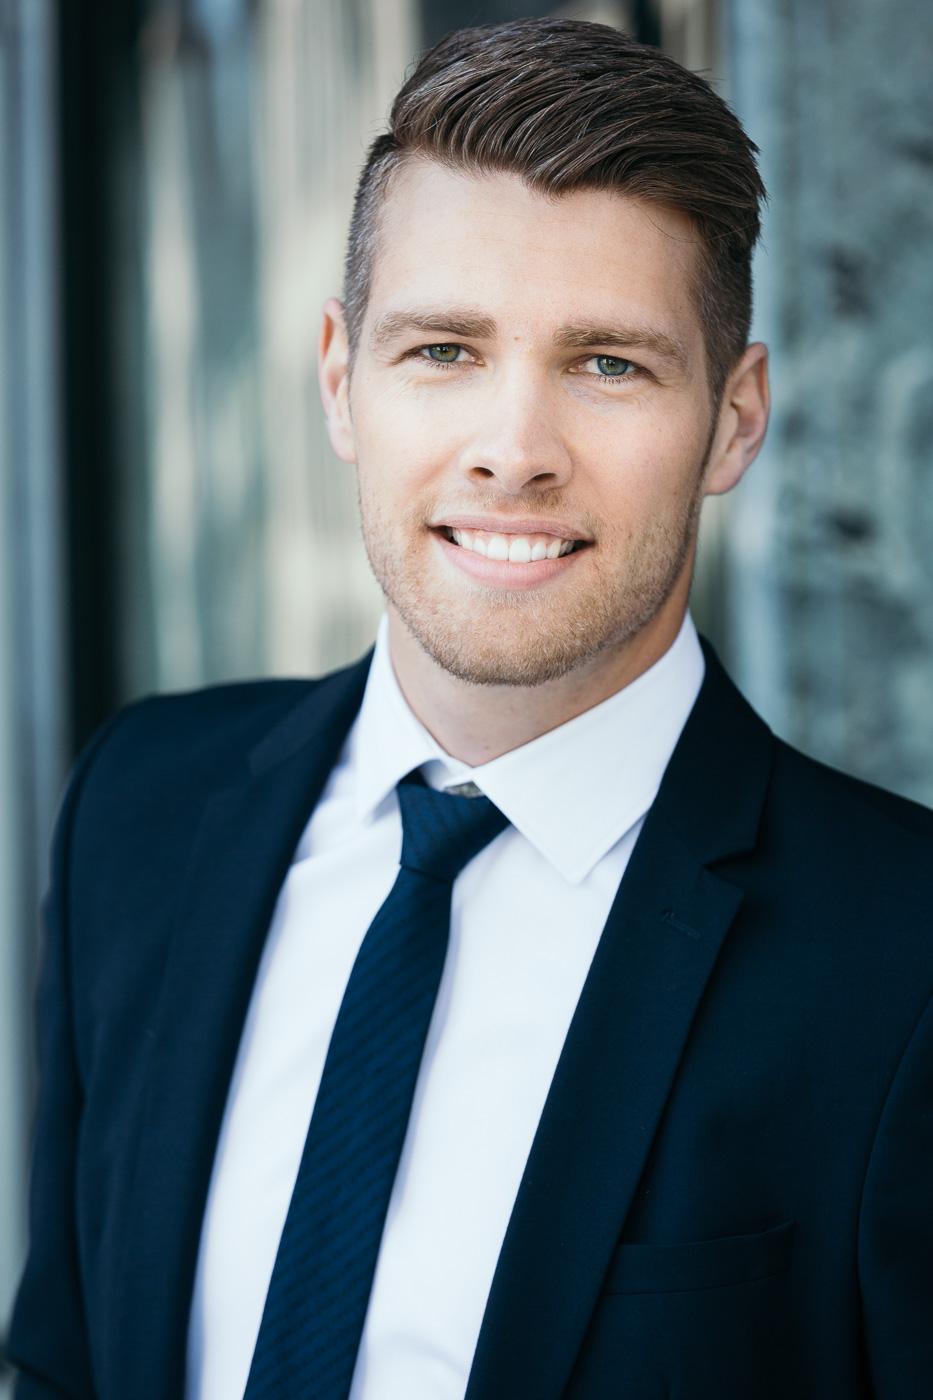 business portraits profilbilder